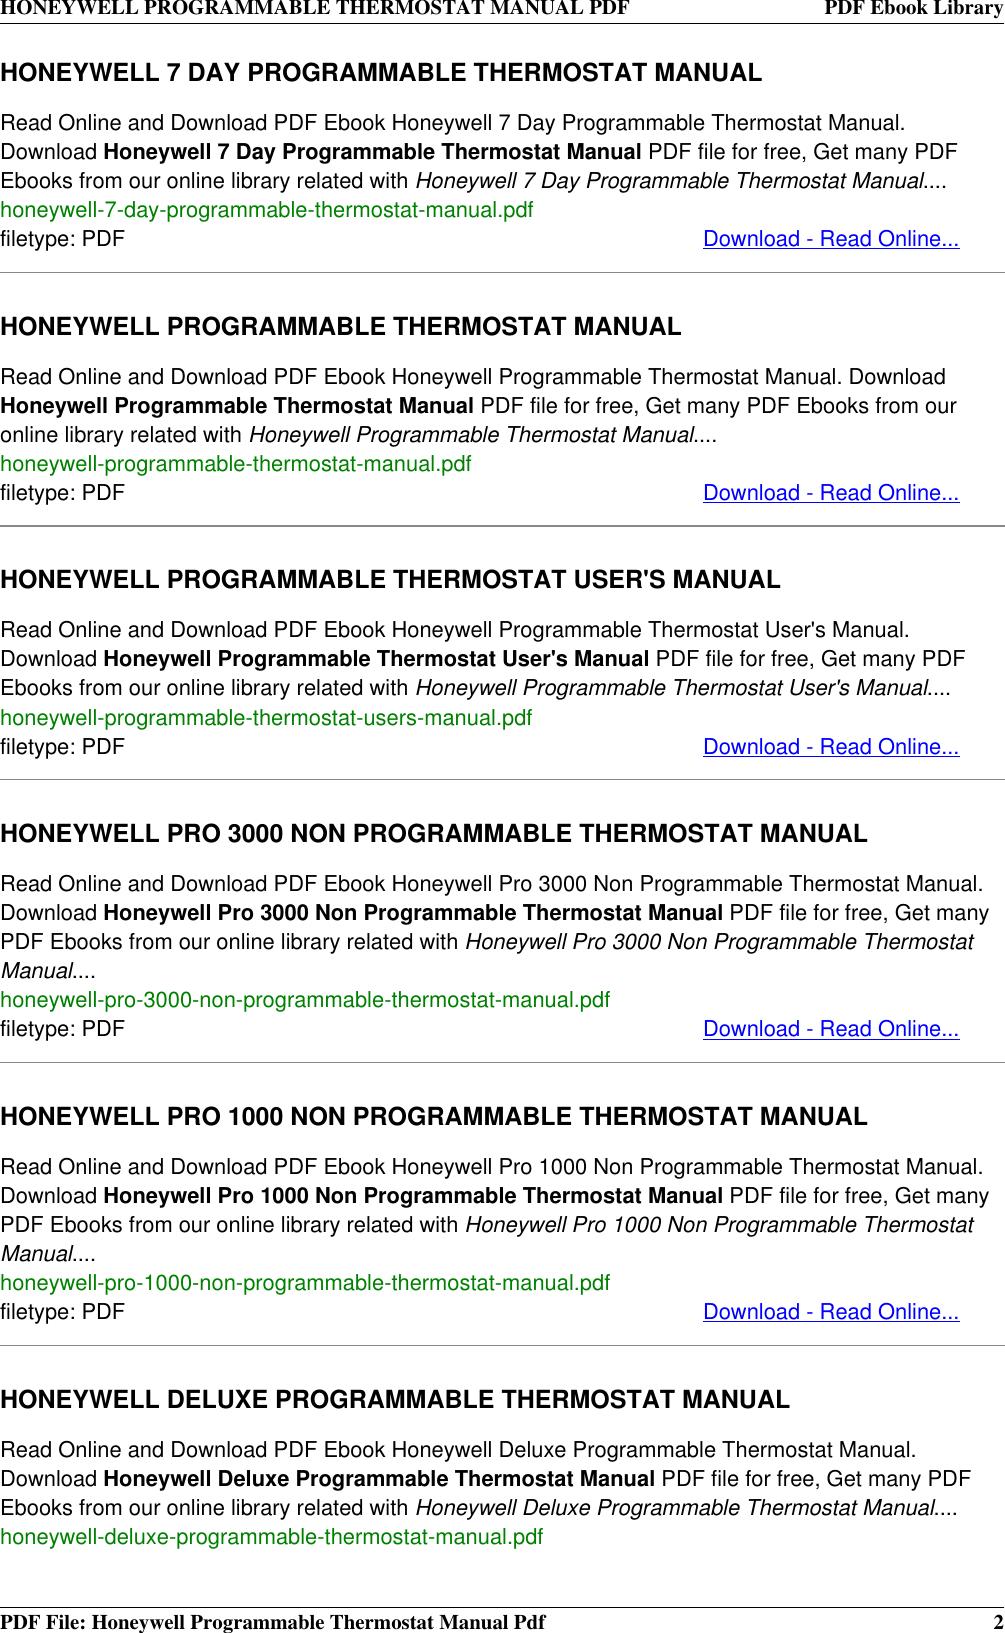 honeywell pro 1000 non programmable thermostat